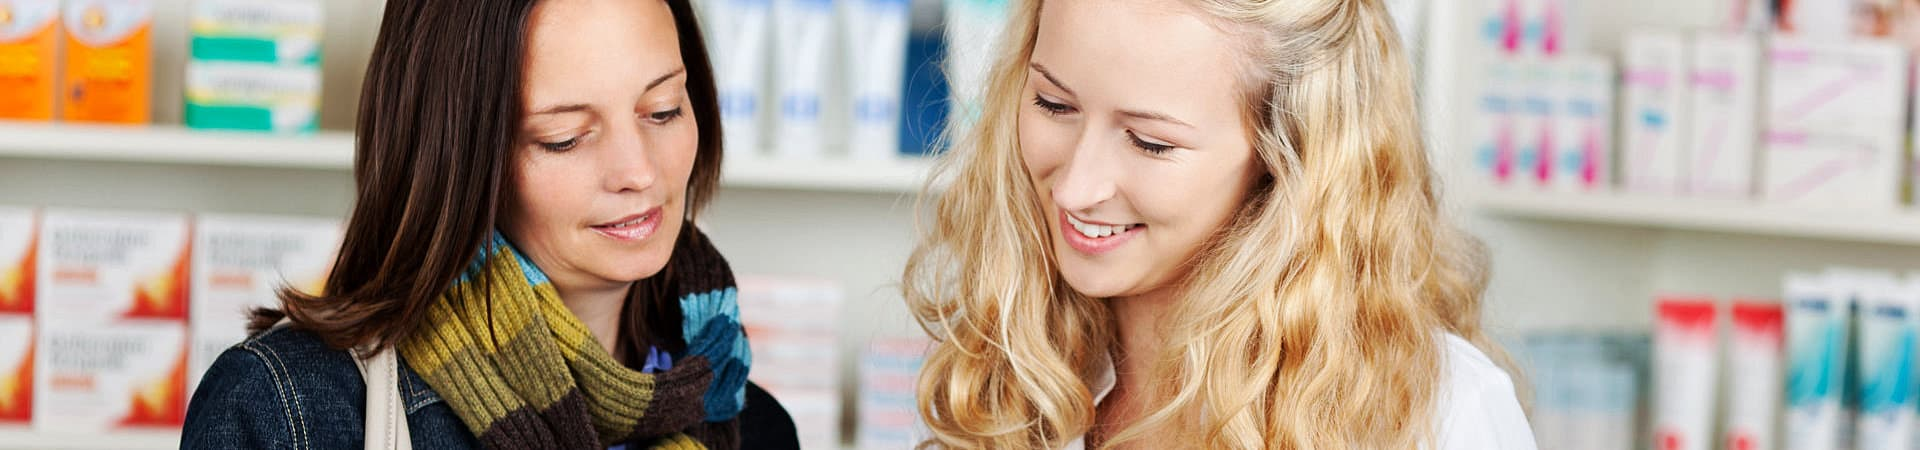 a pharmacist and a customer